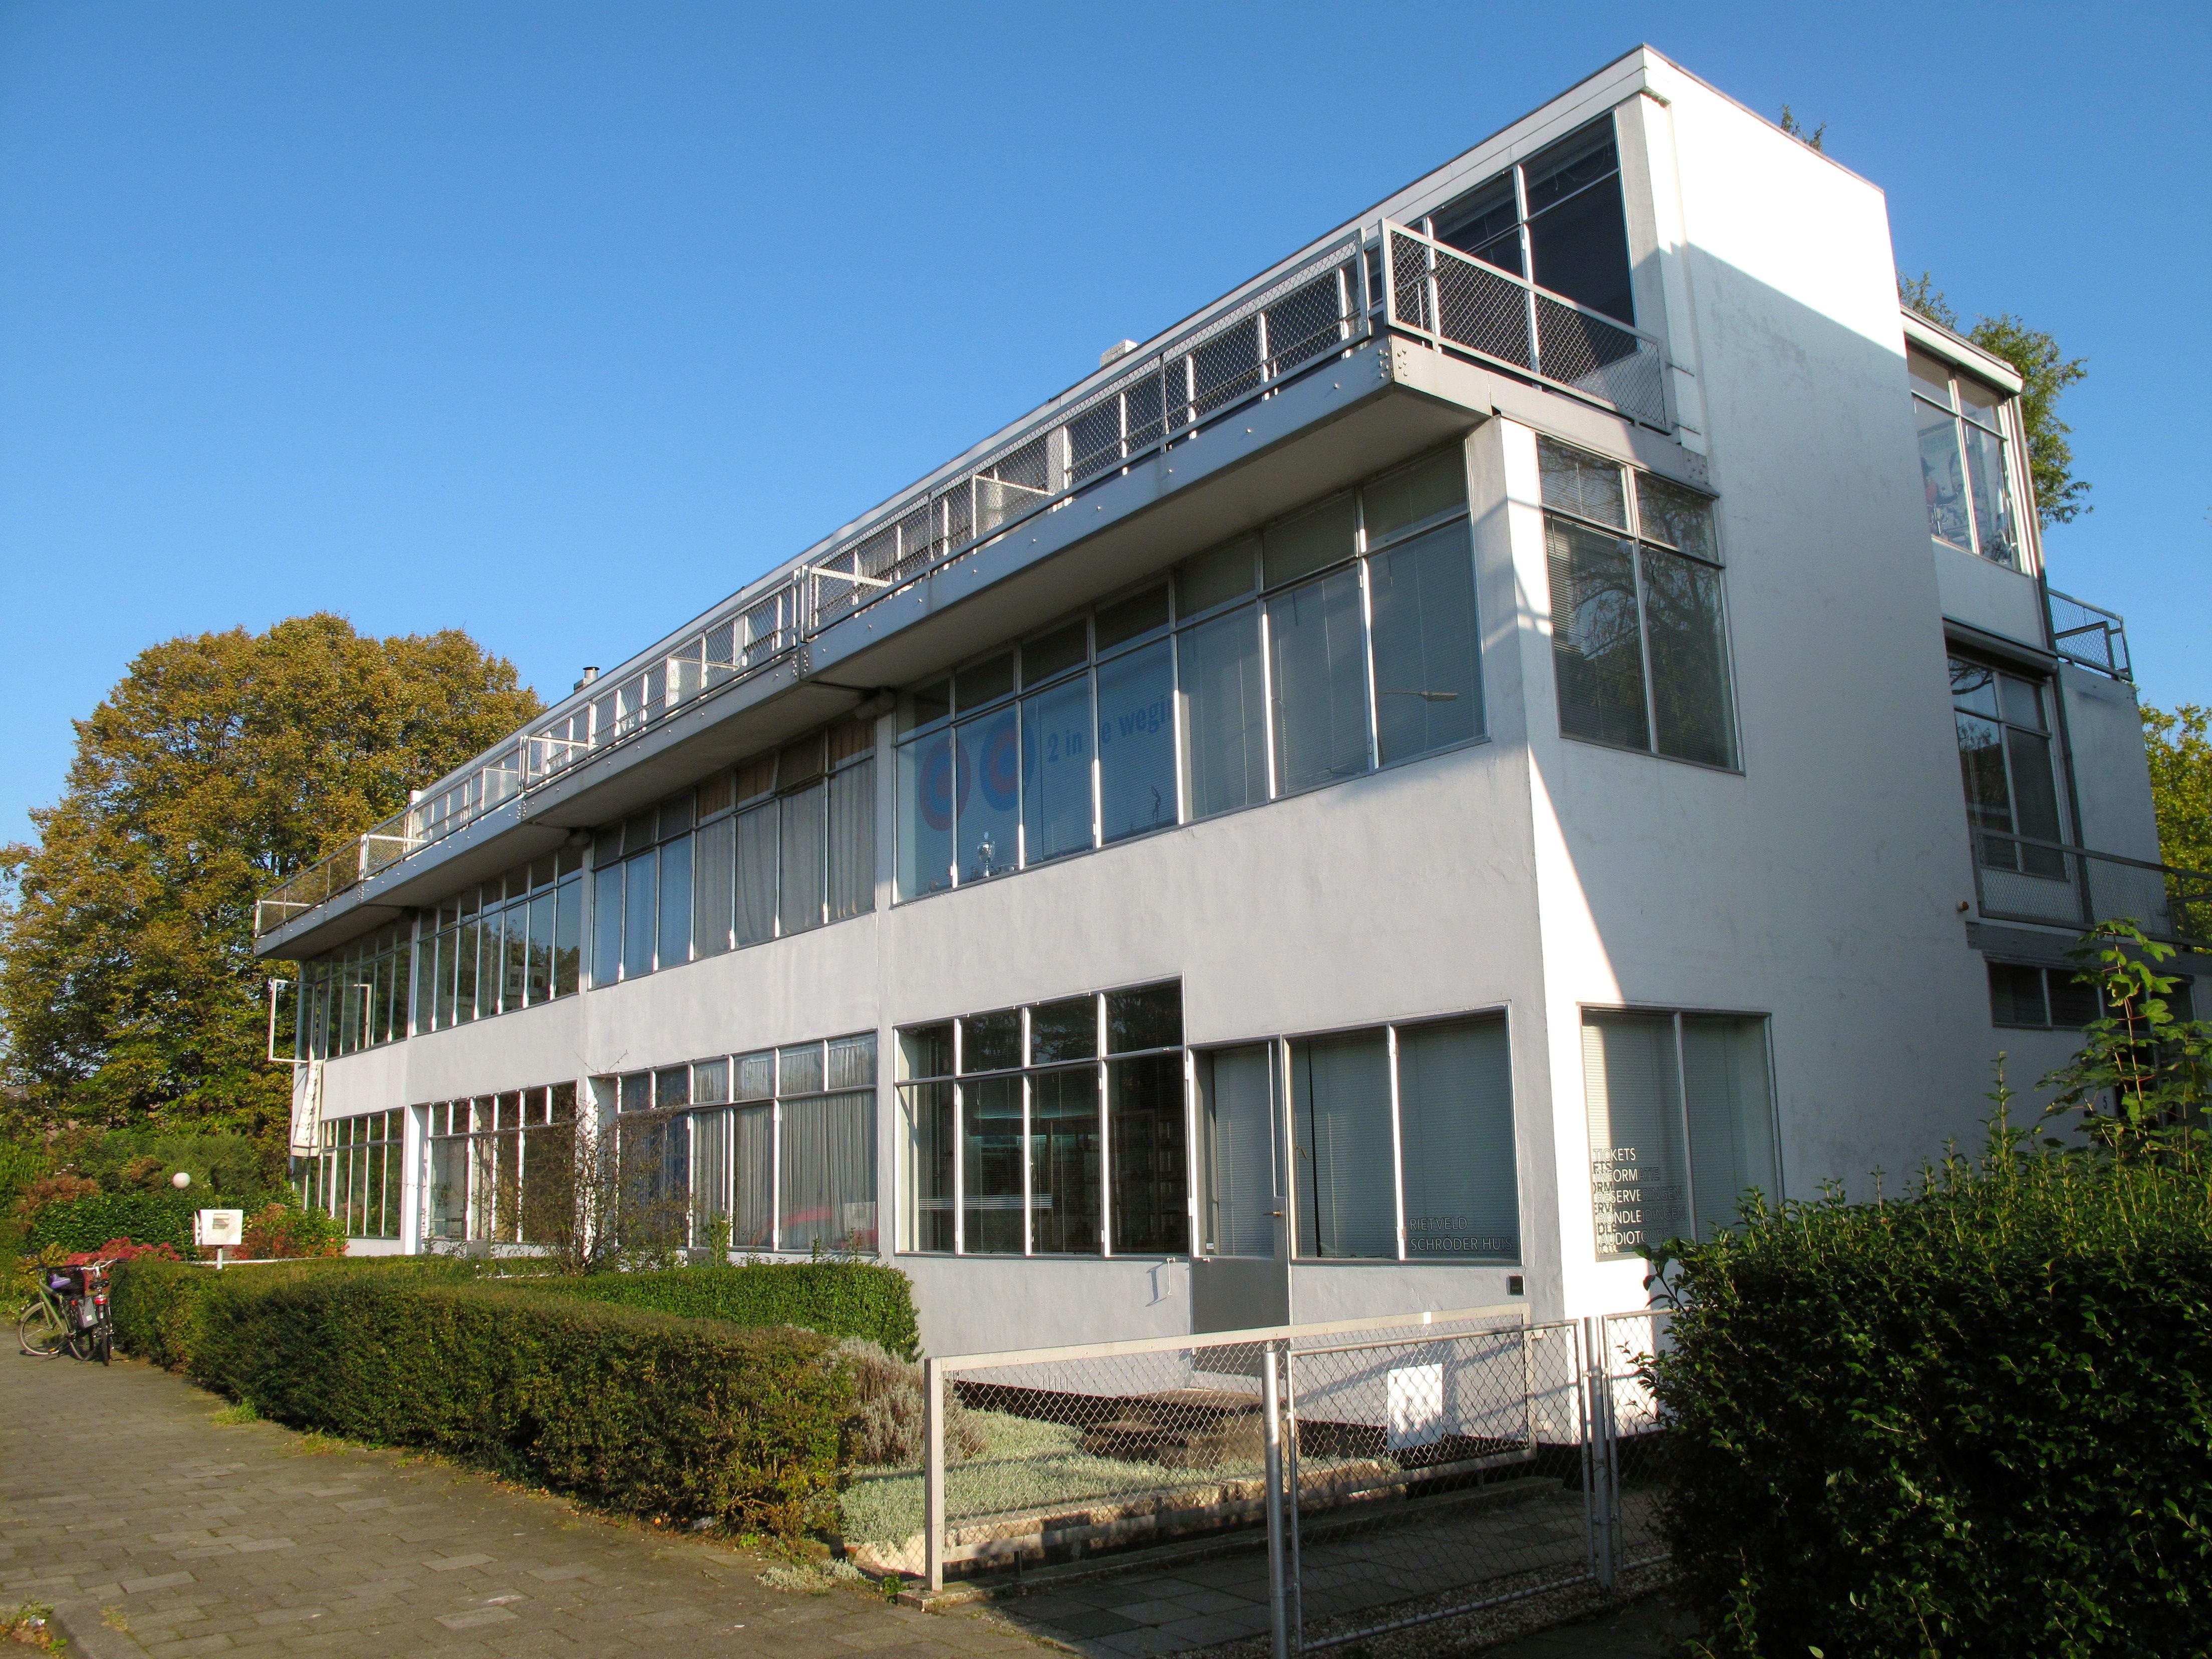 http://upload.wikimedia.org/wikipedia/commons/1/14/Appartentenblok_naast_Rietveld-Schroderhuis.jpg